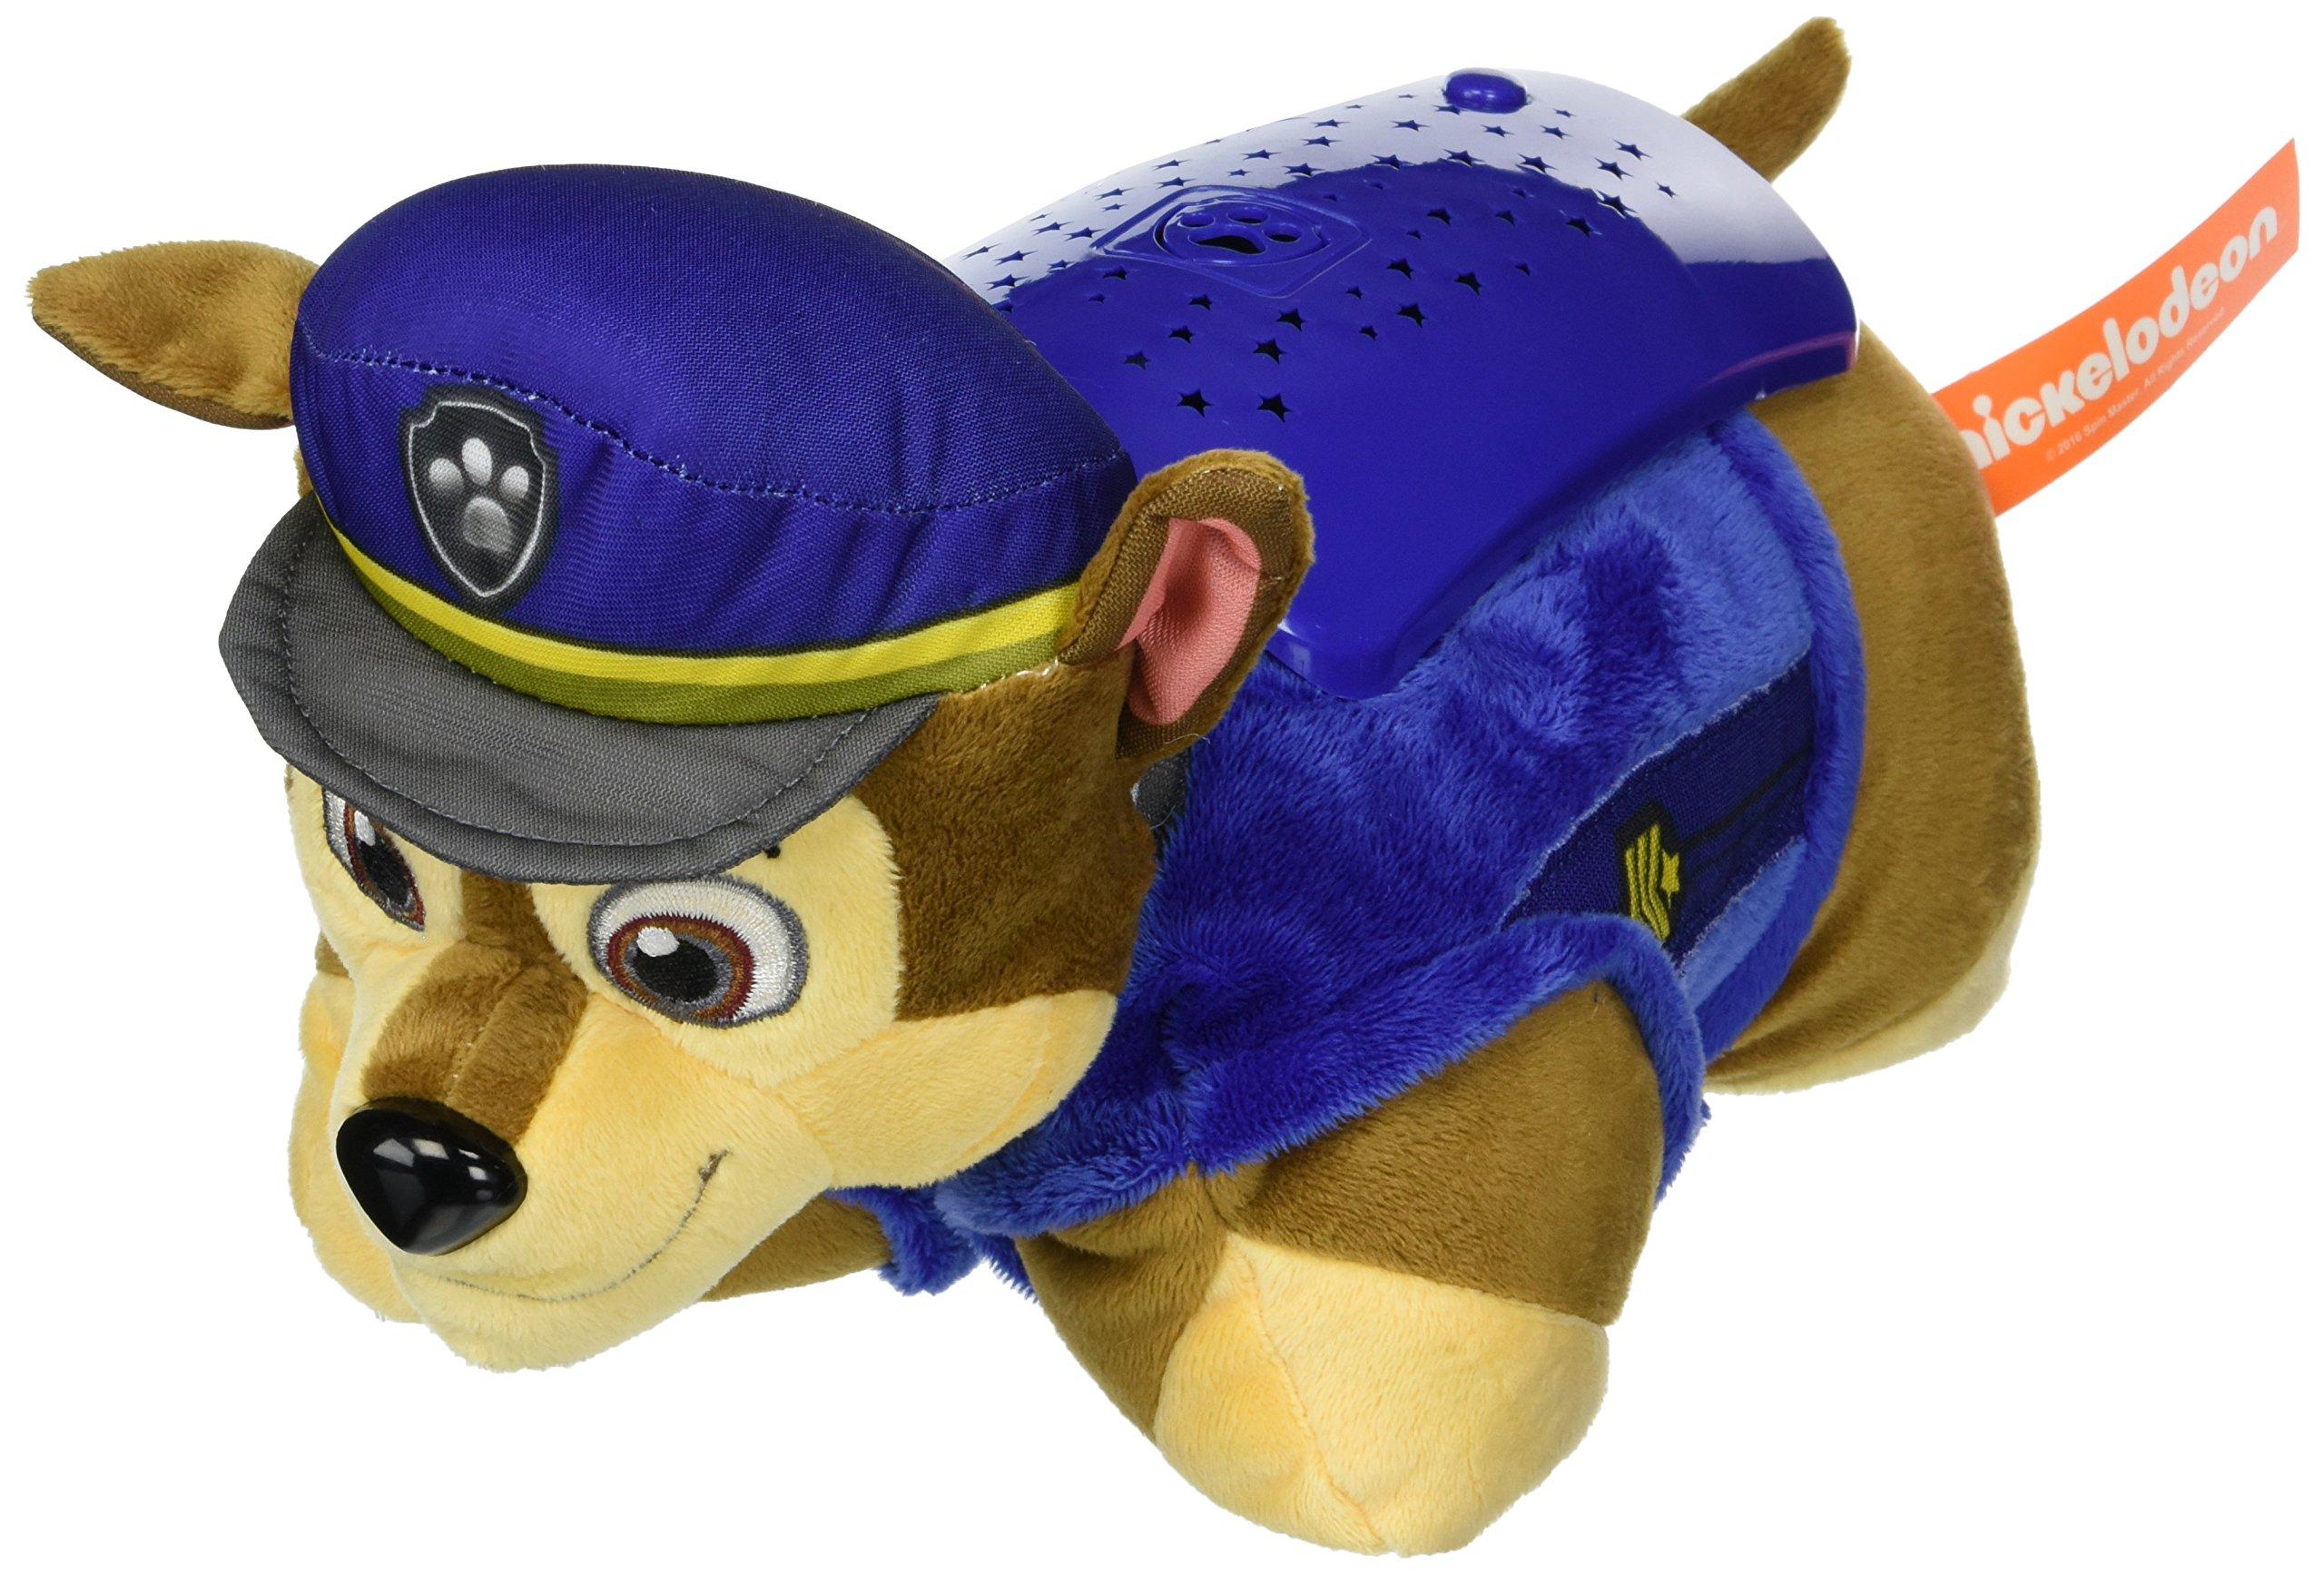 Pillow Pets Nickelodeon Paw Patrol Chase Dream Lites  Stuffed Animal Night Light